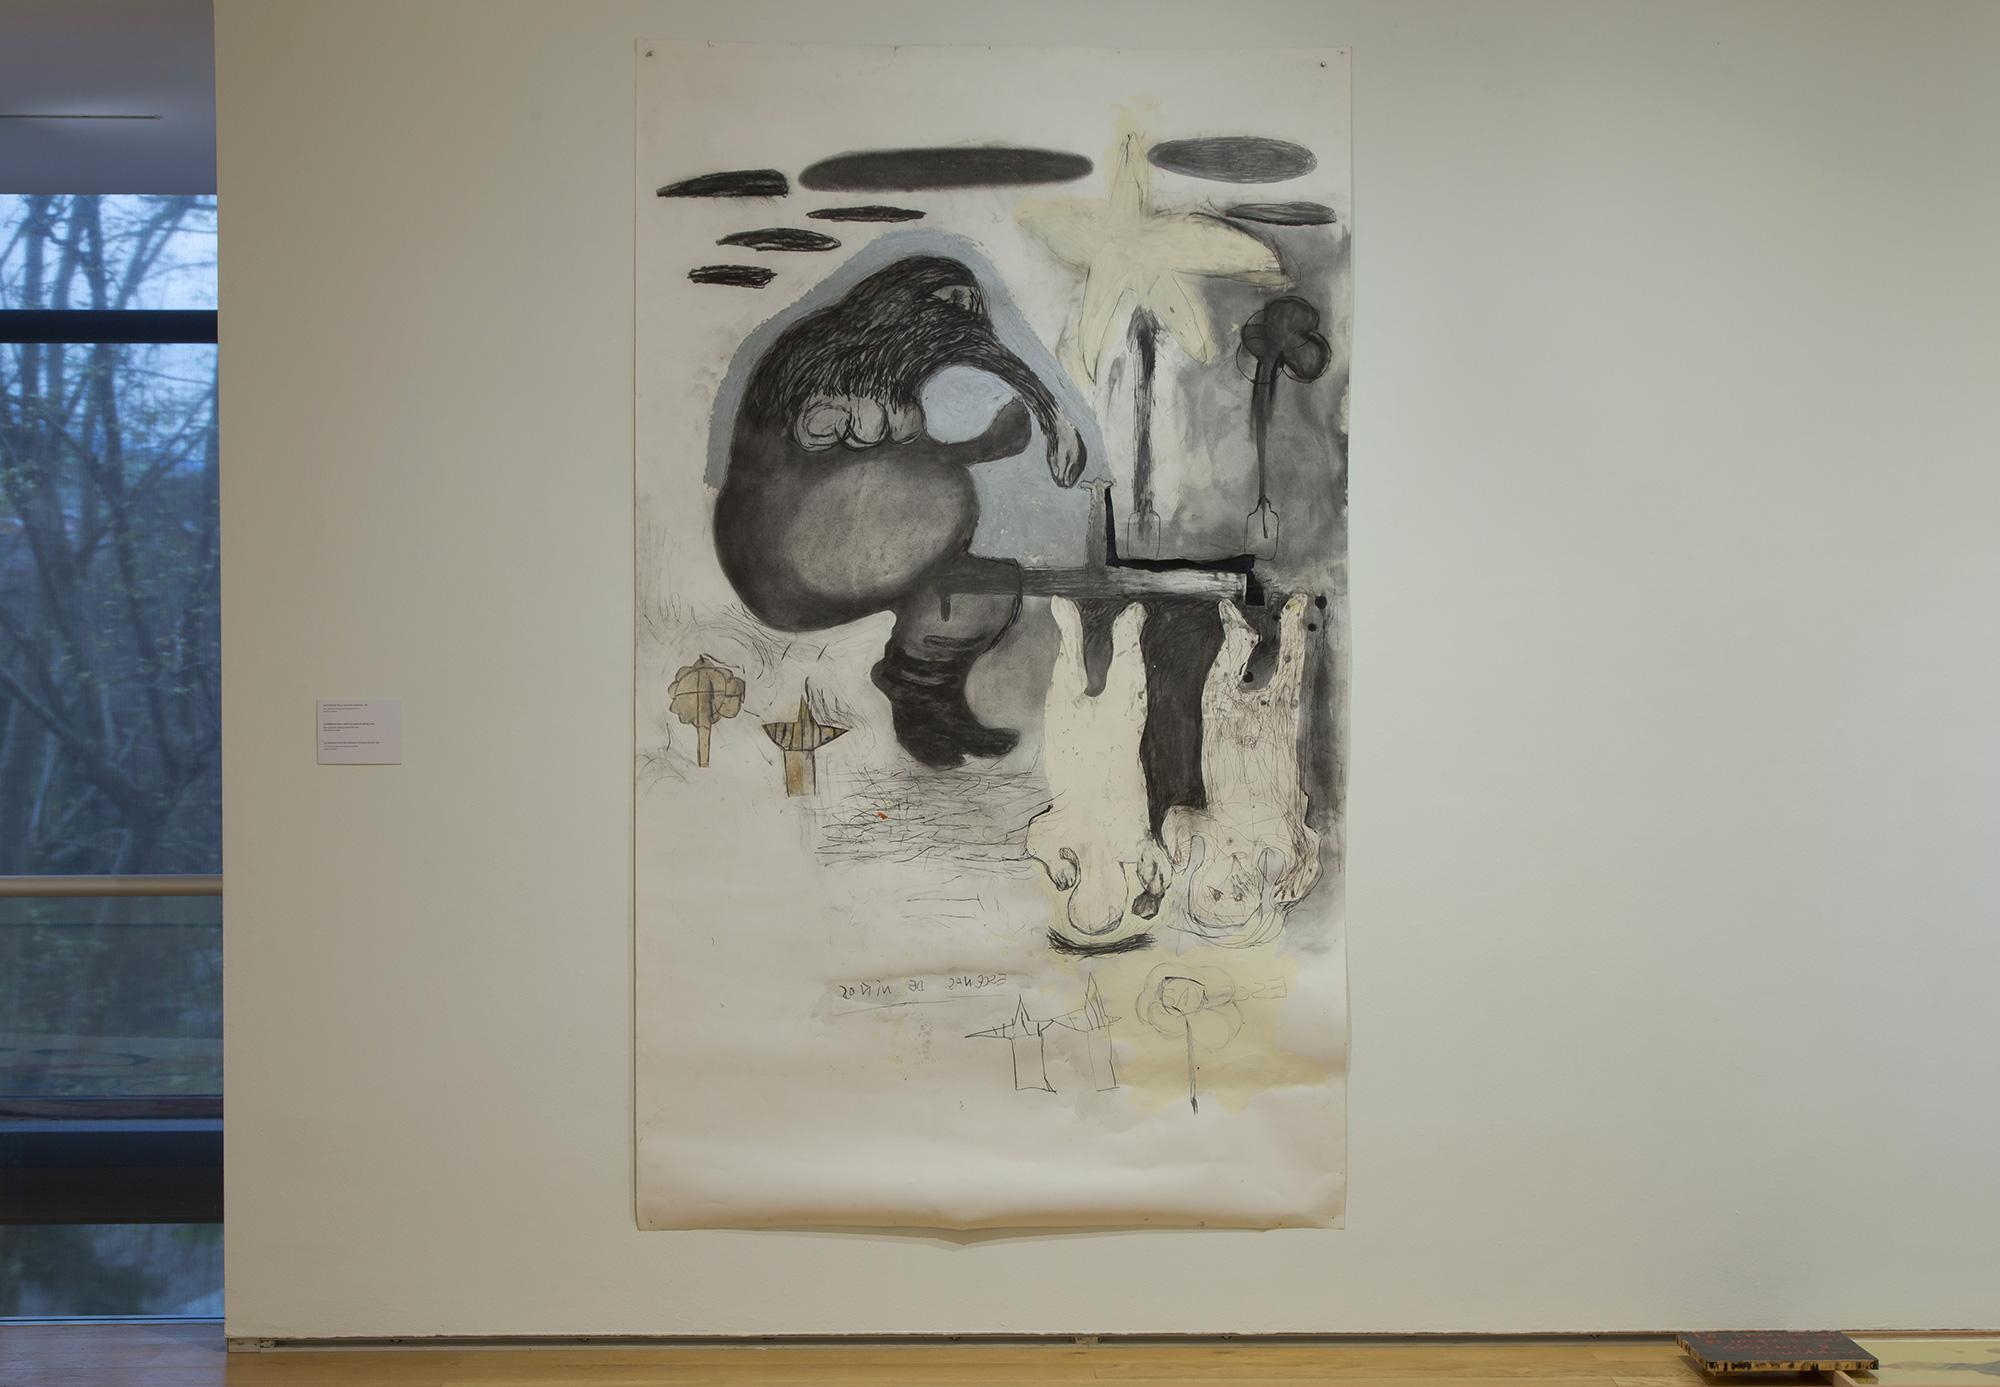 Susana Talayero (2016) - Crónica inquieta 1987-2016